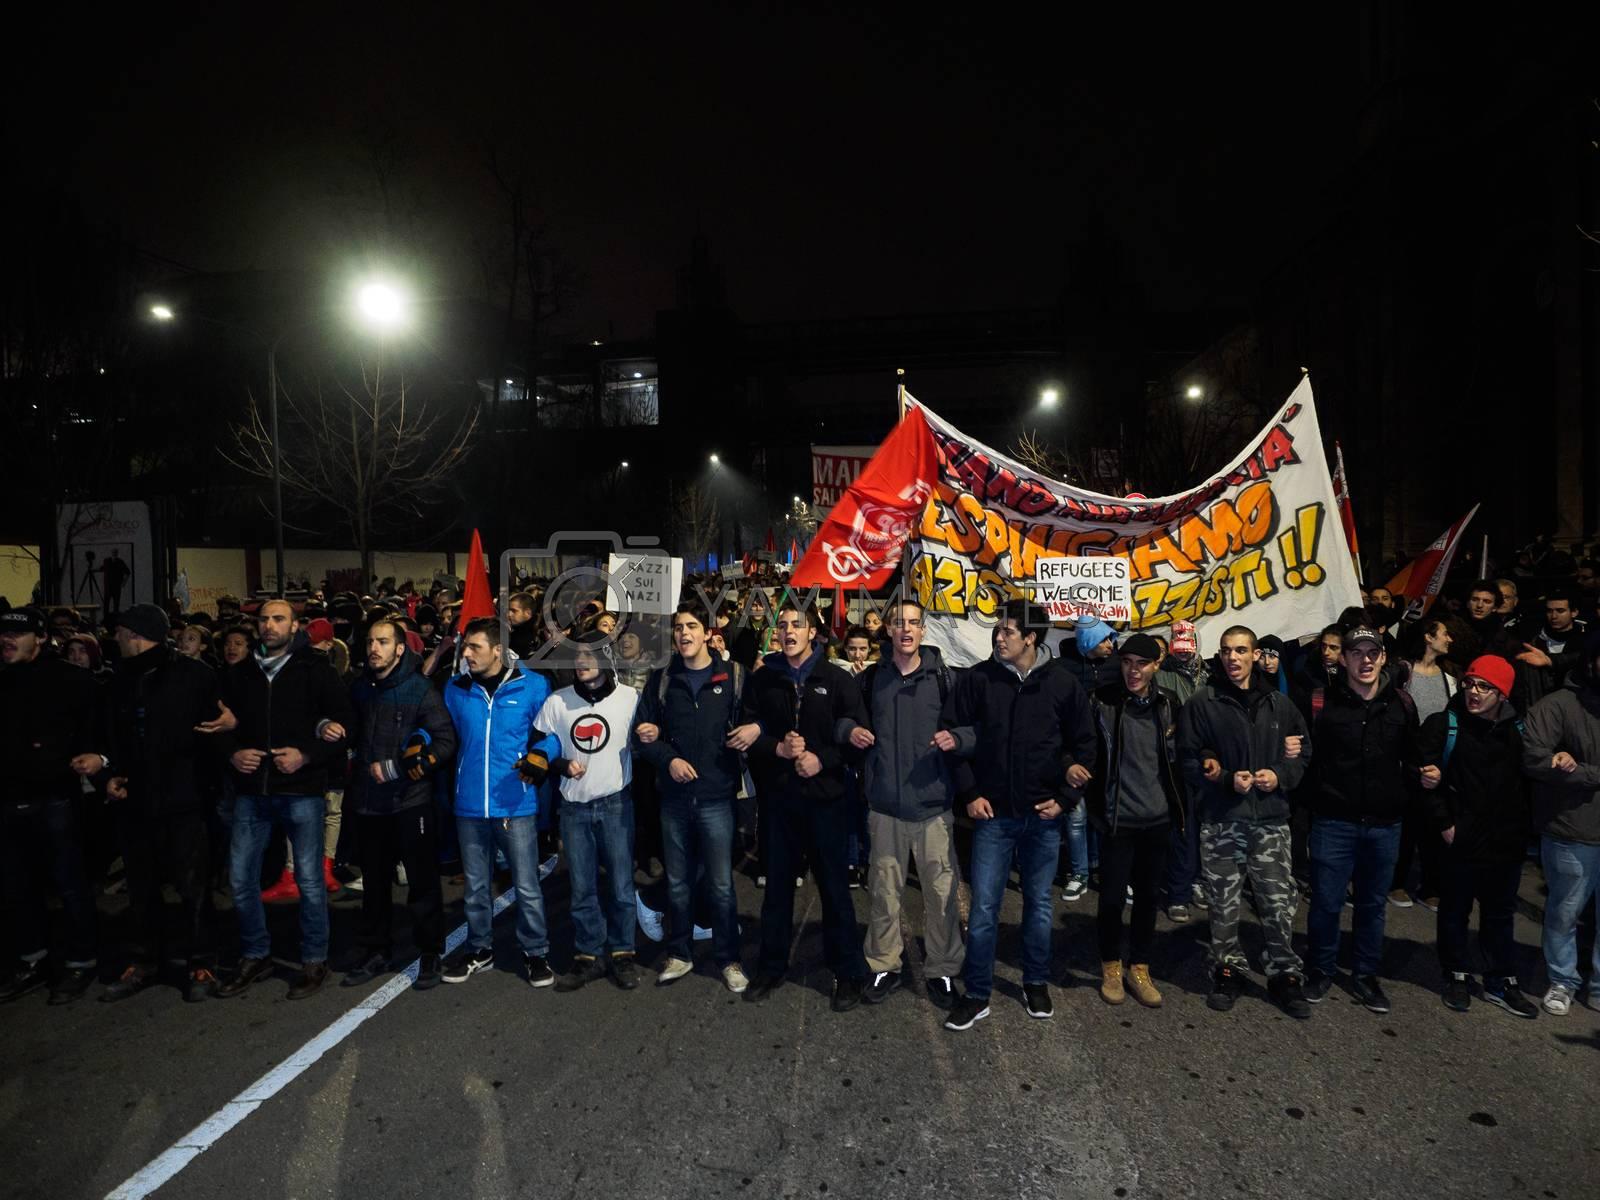 Royalty free image of ITALY - POLITICS - ANTI-FASCIST PROTEST by newzulu